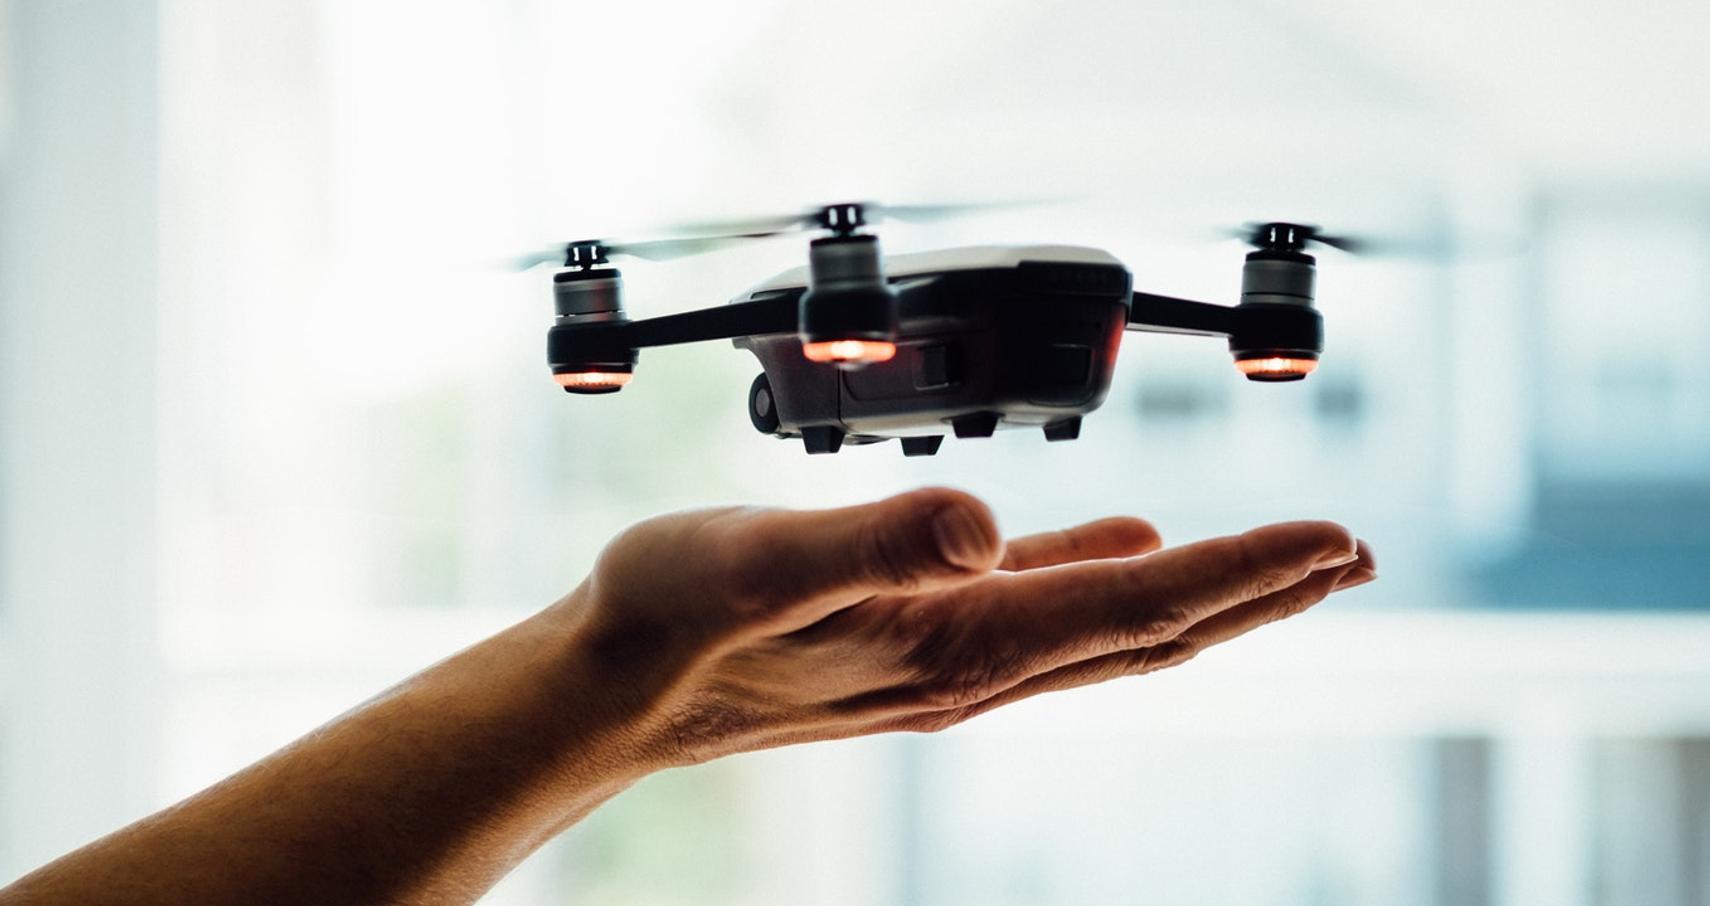 Top Drones Under $100 - 2019  Best Drone Under 100 Dollars With